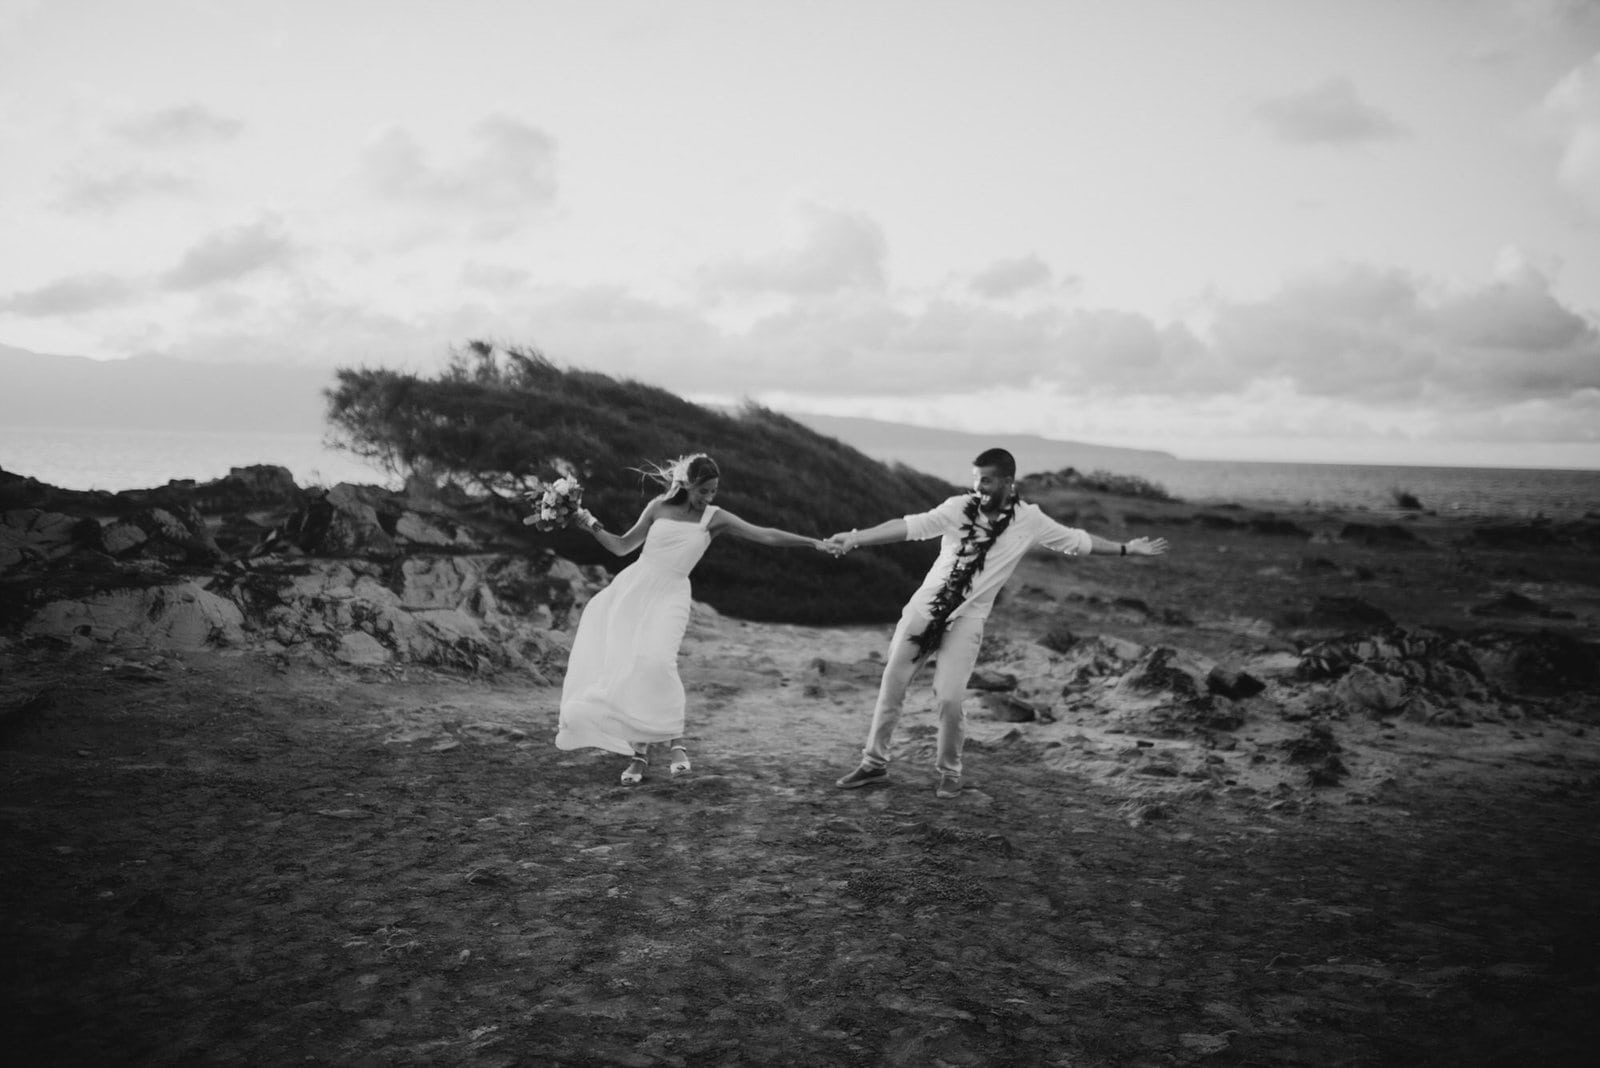 bride and groom celebrating marraige